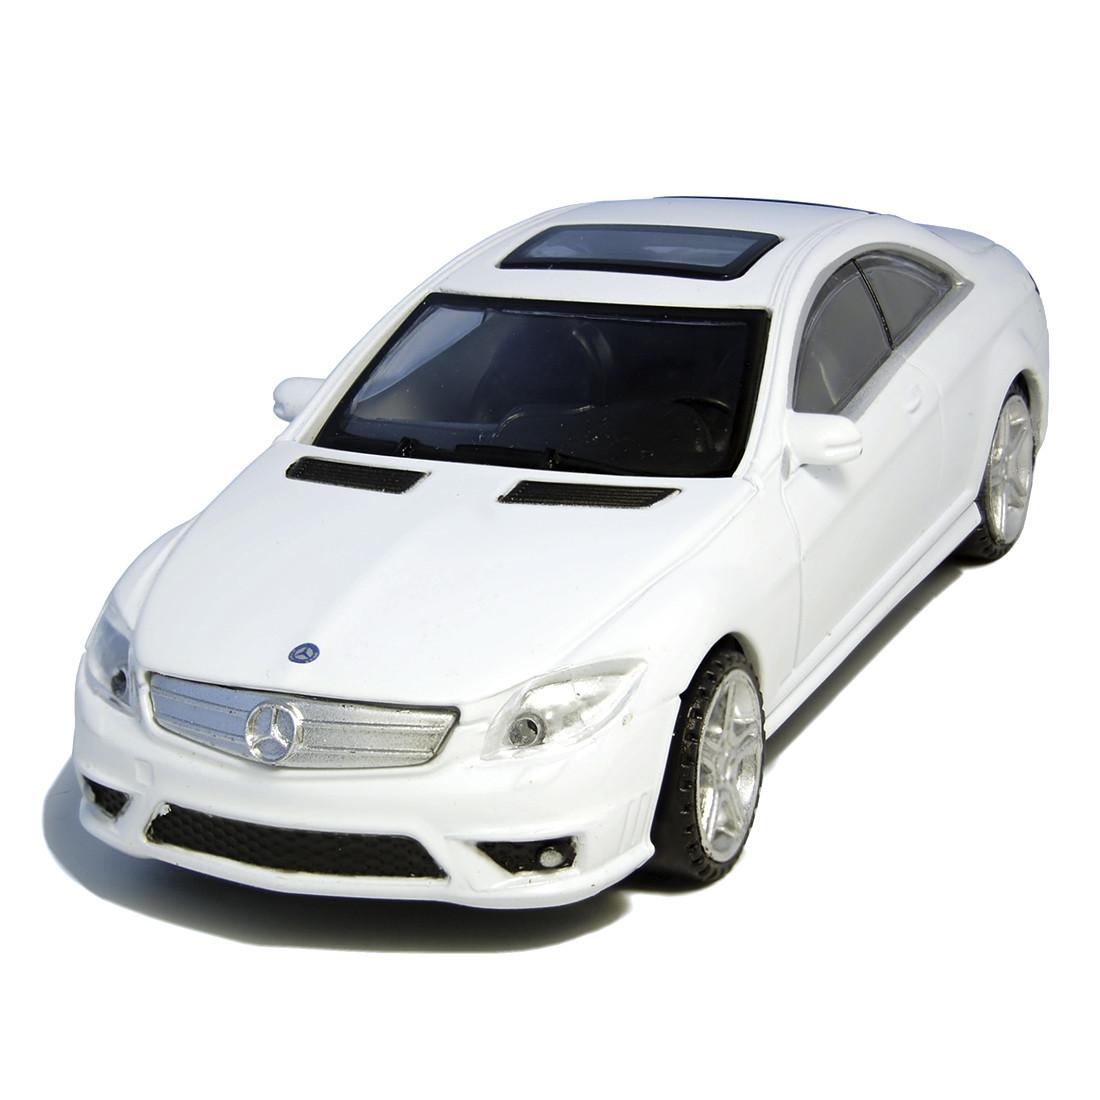 Металлическая машинка RASTAR 34300W Mercedes-Benz CL 63 AMG (11 см, White)